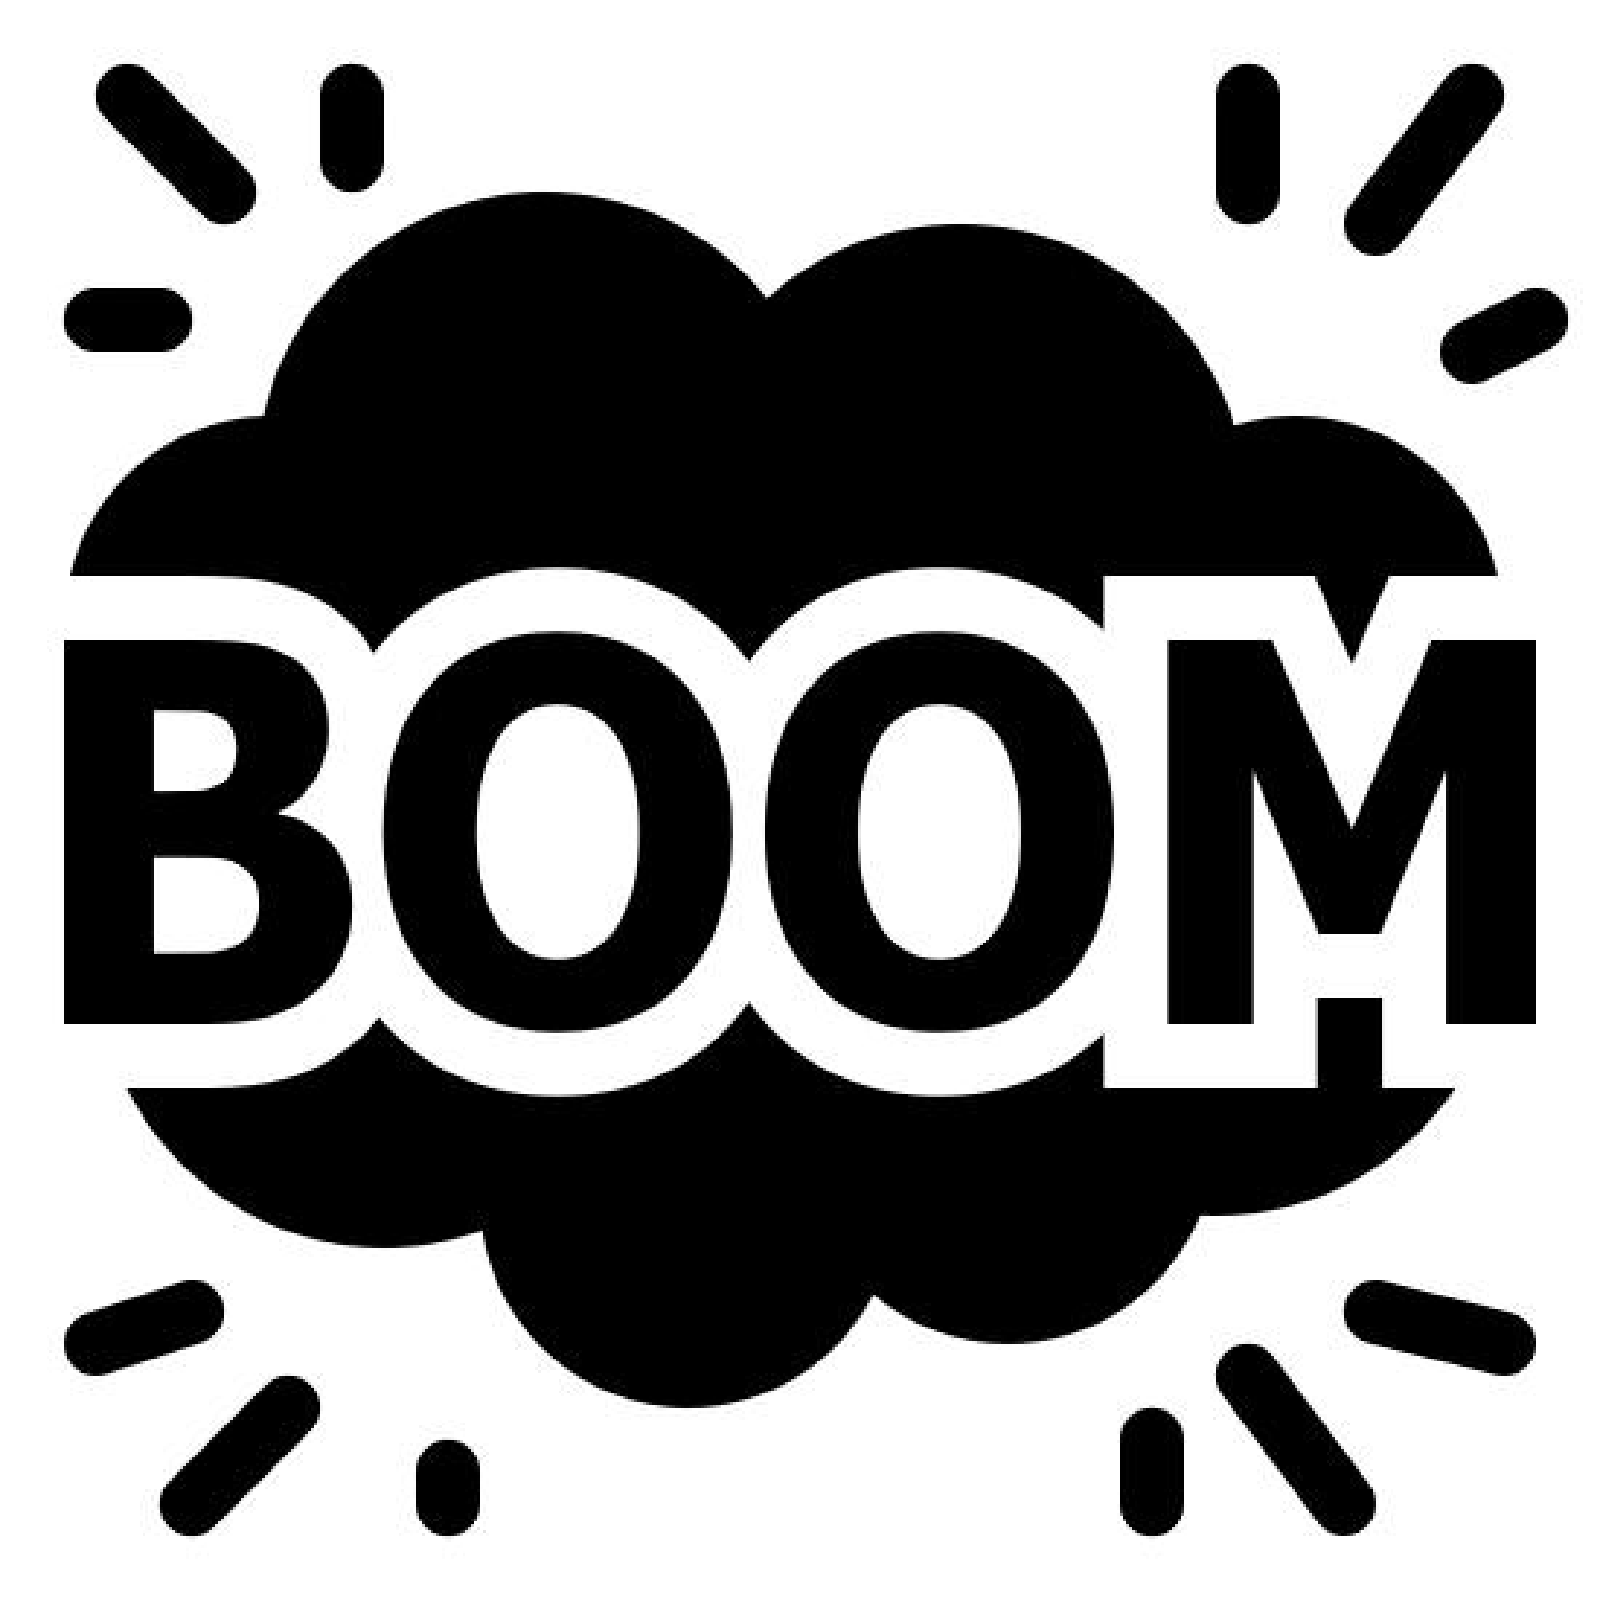 Бум icon